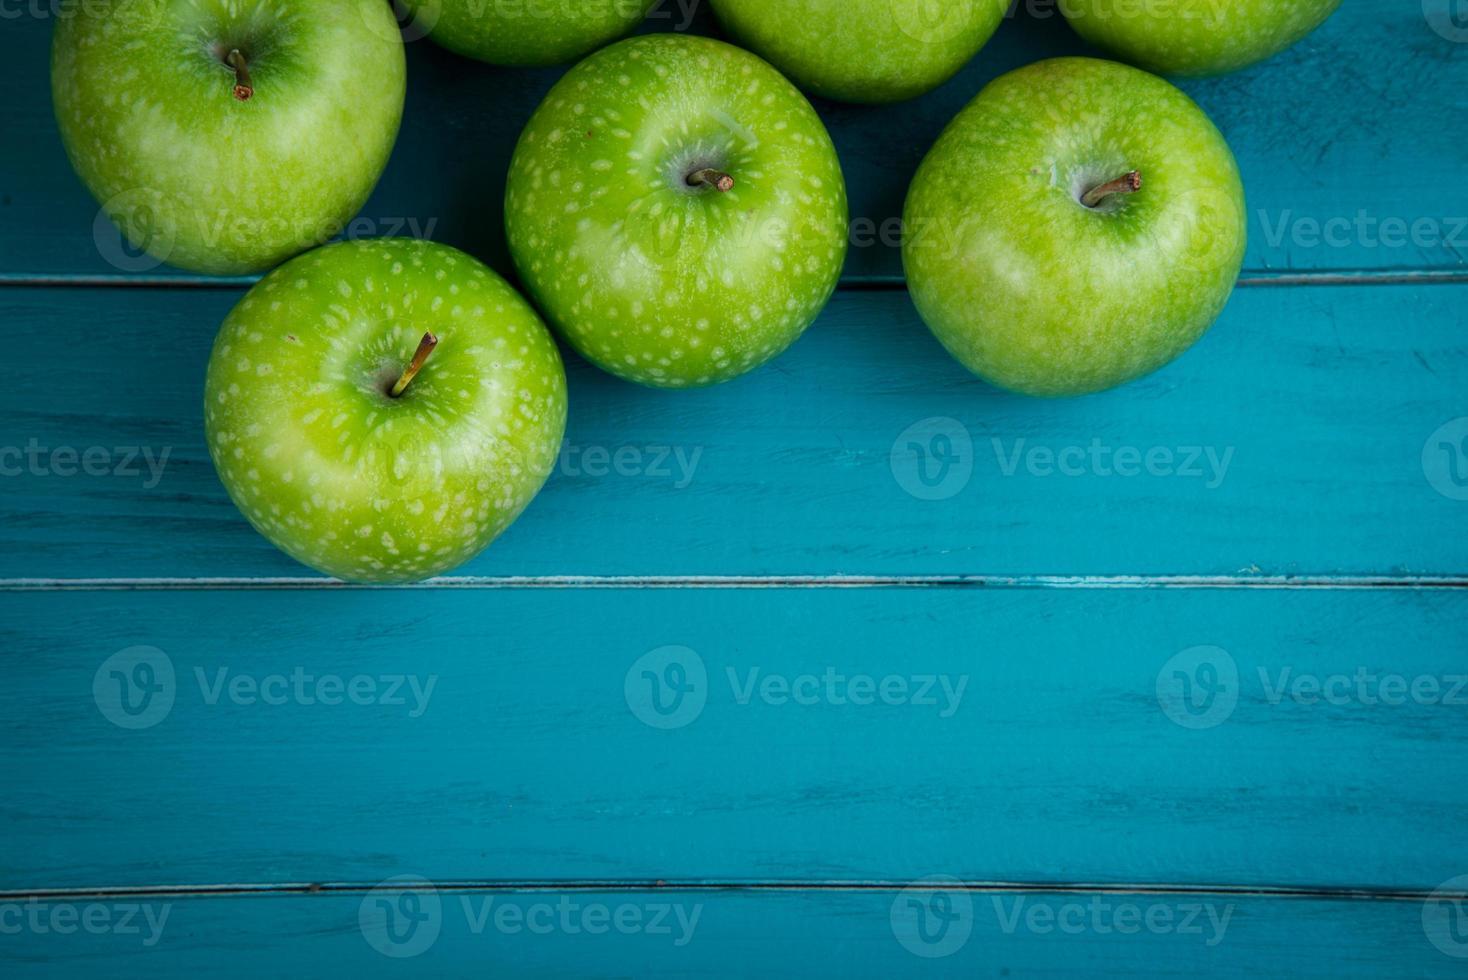 boerderij verse biologische groene appels op houten retro tafel foto